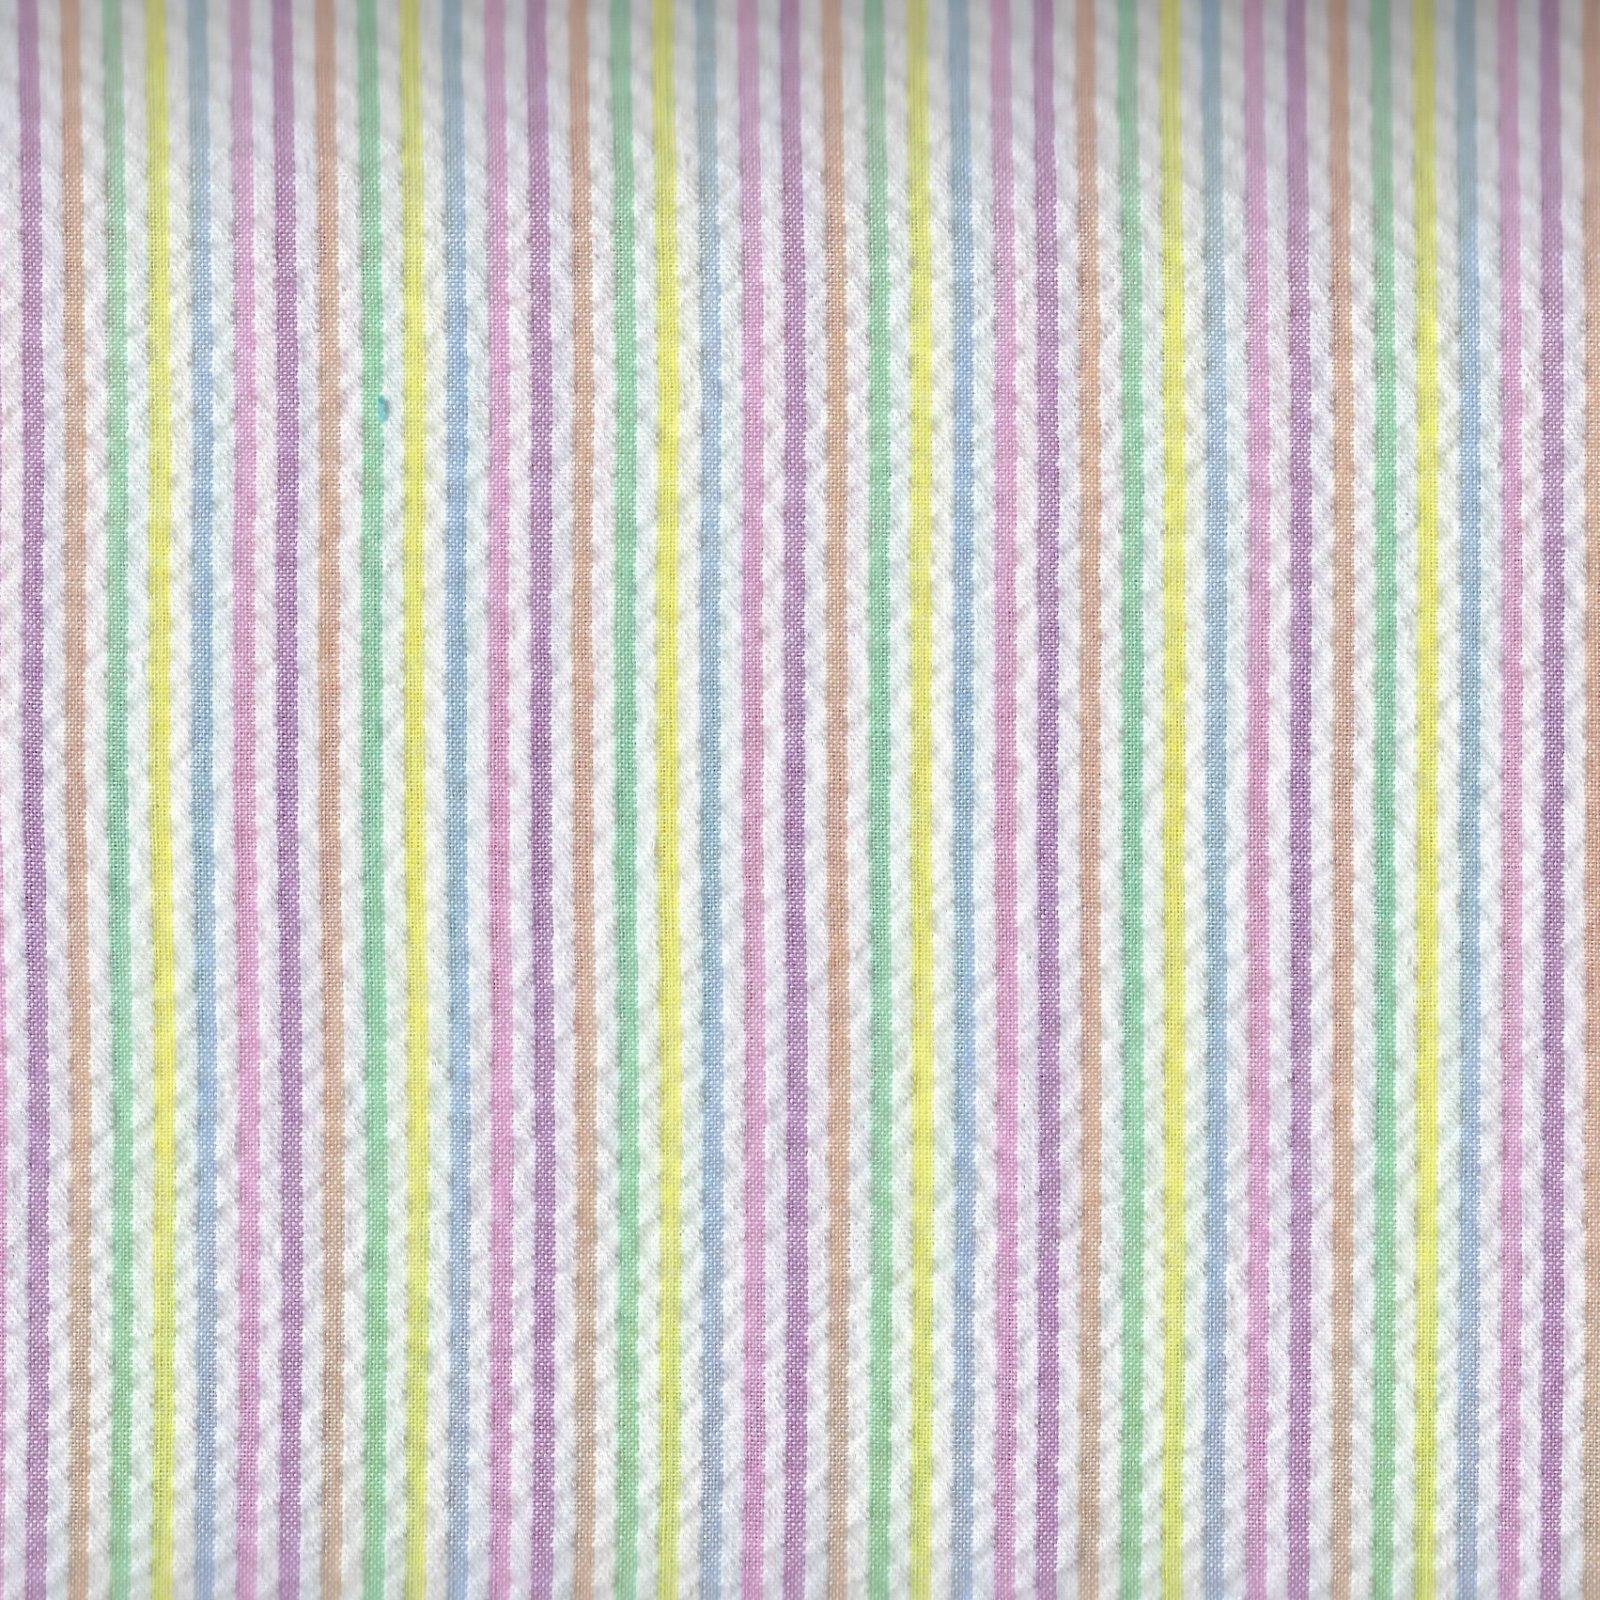 Spechler Vogel - Seersucker Pastel Multi-Stripe